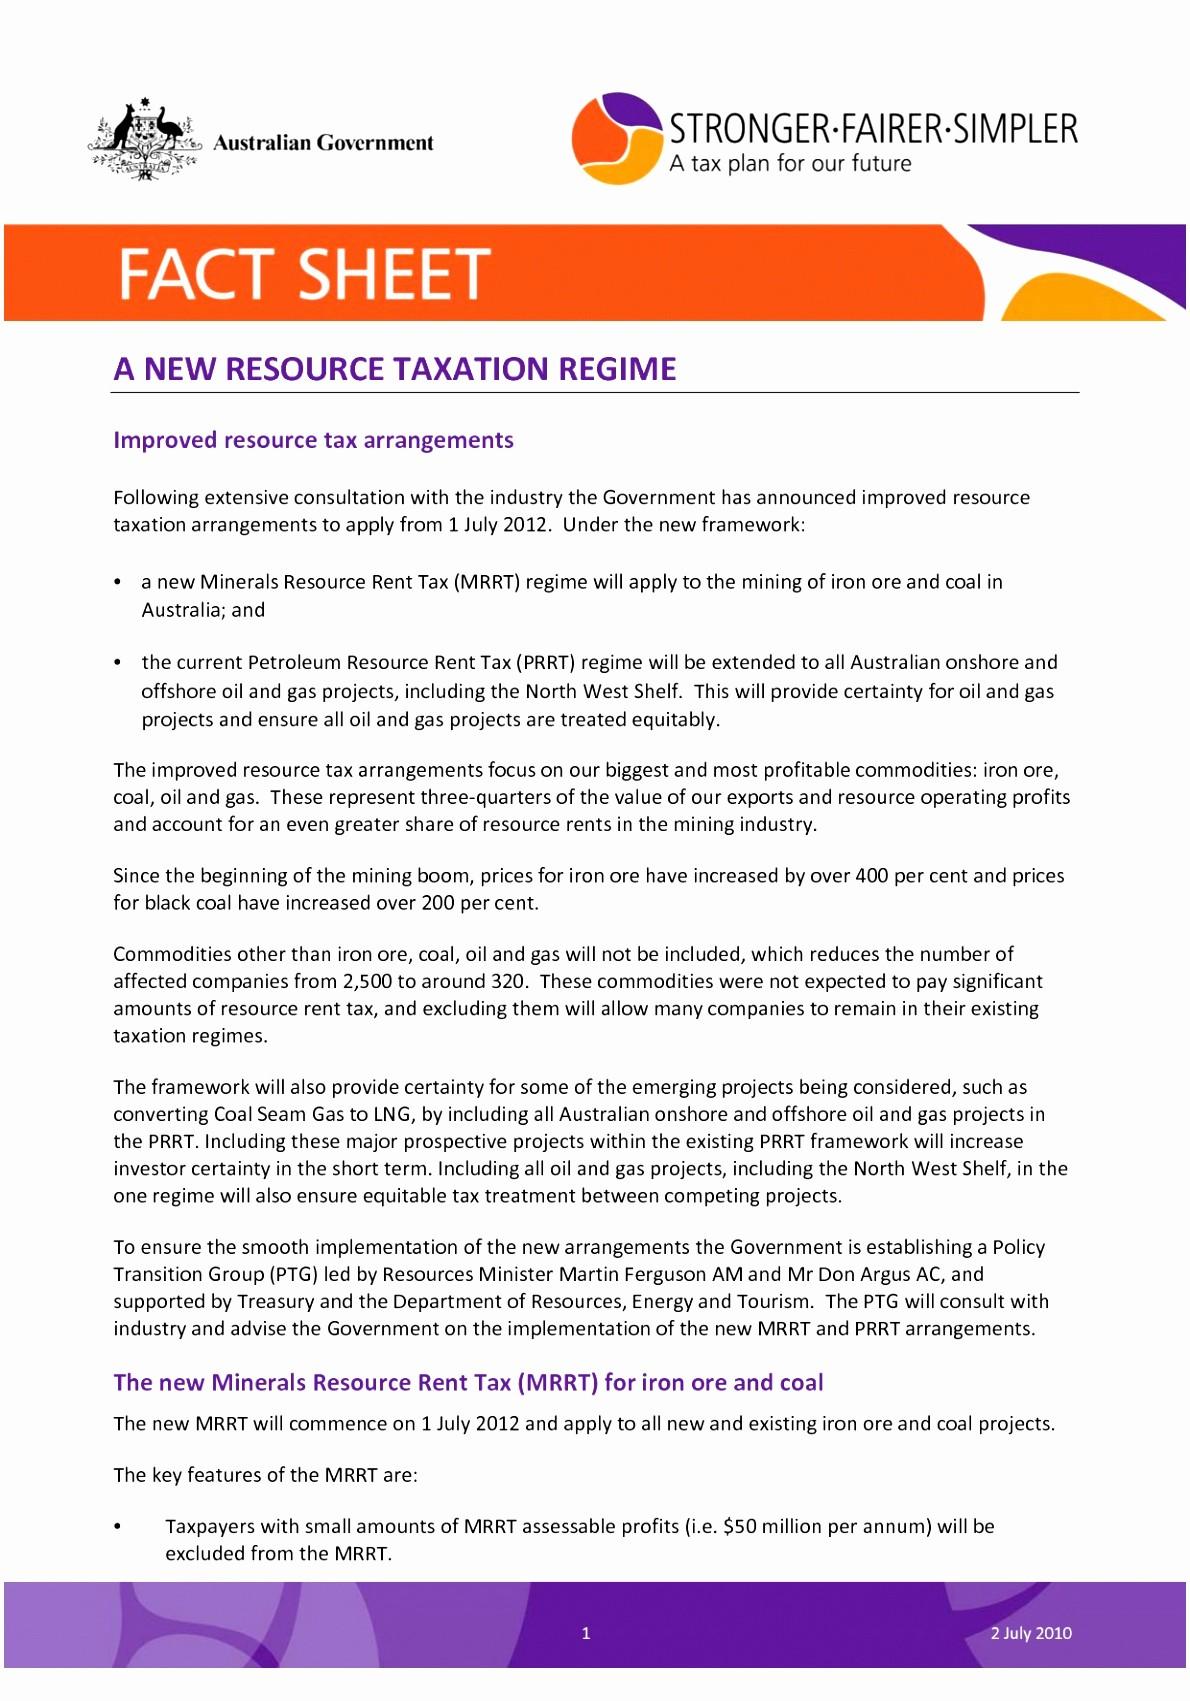 Fact Sheet Templates Microsoft Word Unique 6 Fact Sheet Template Microsoft Word Pupwu